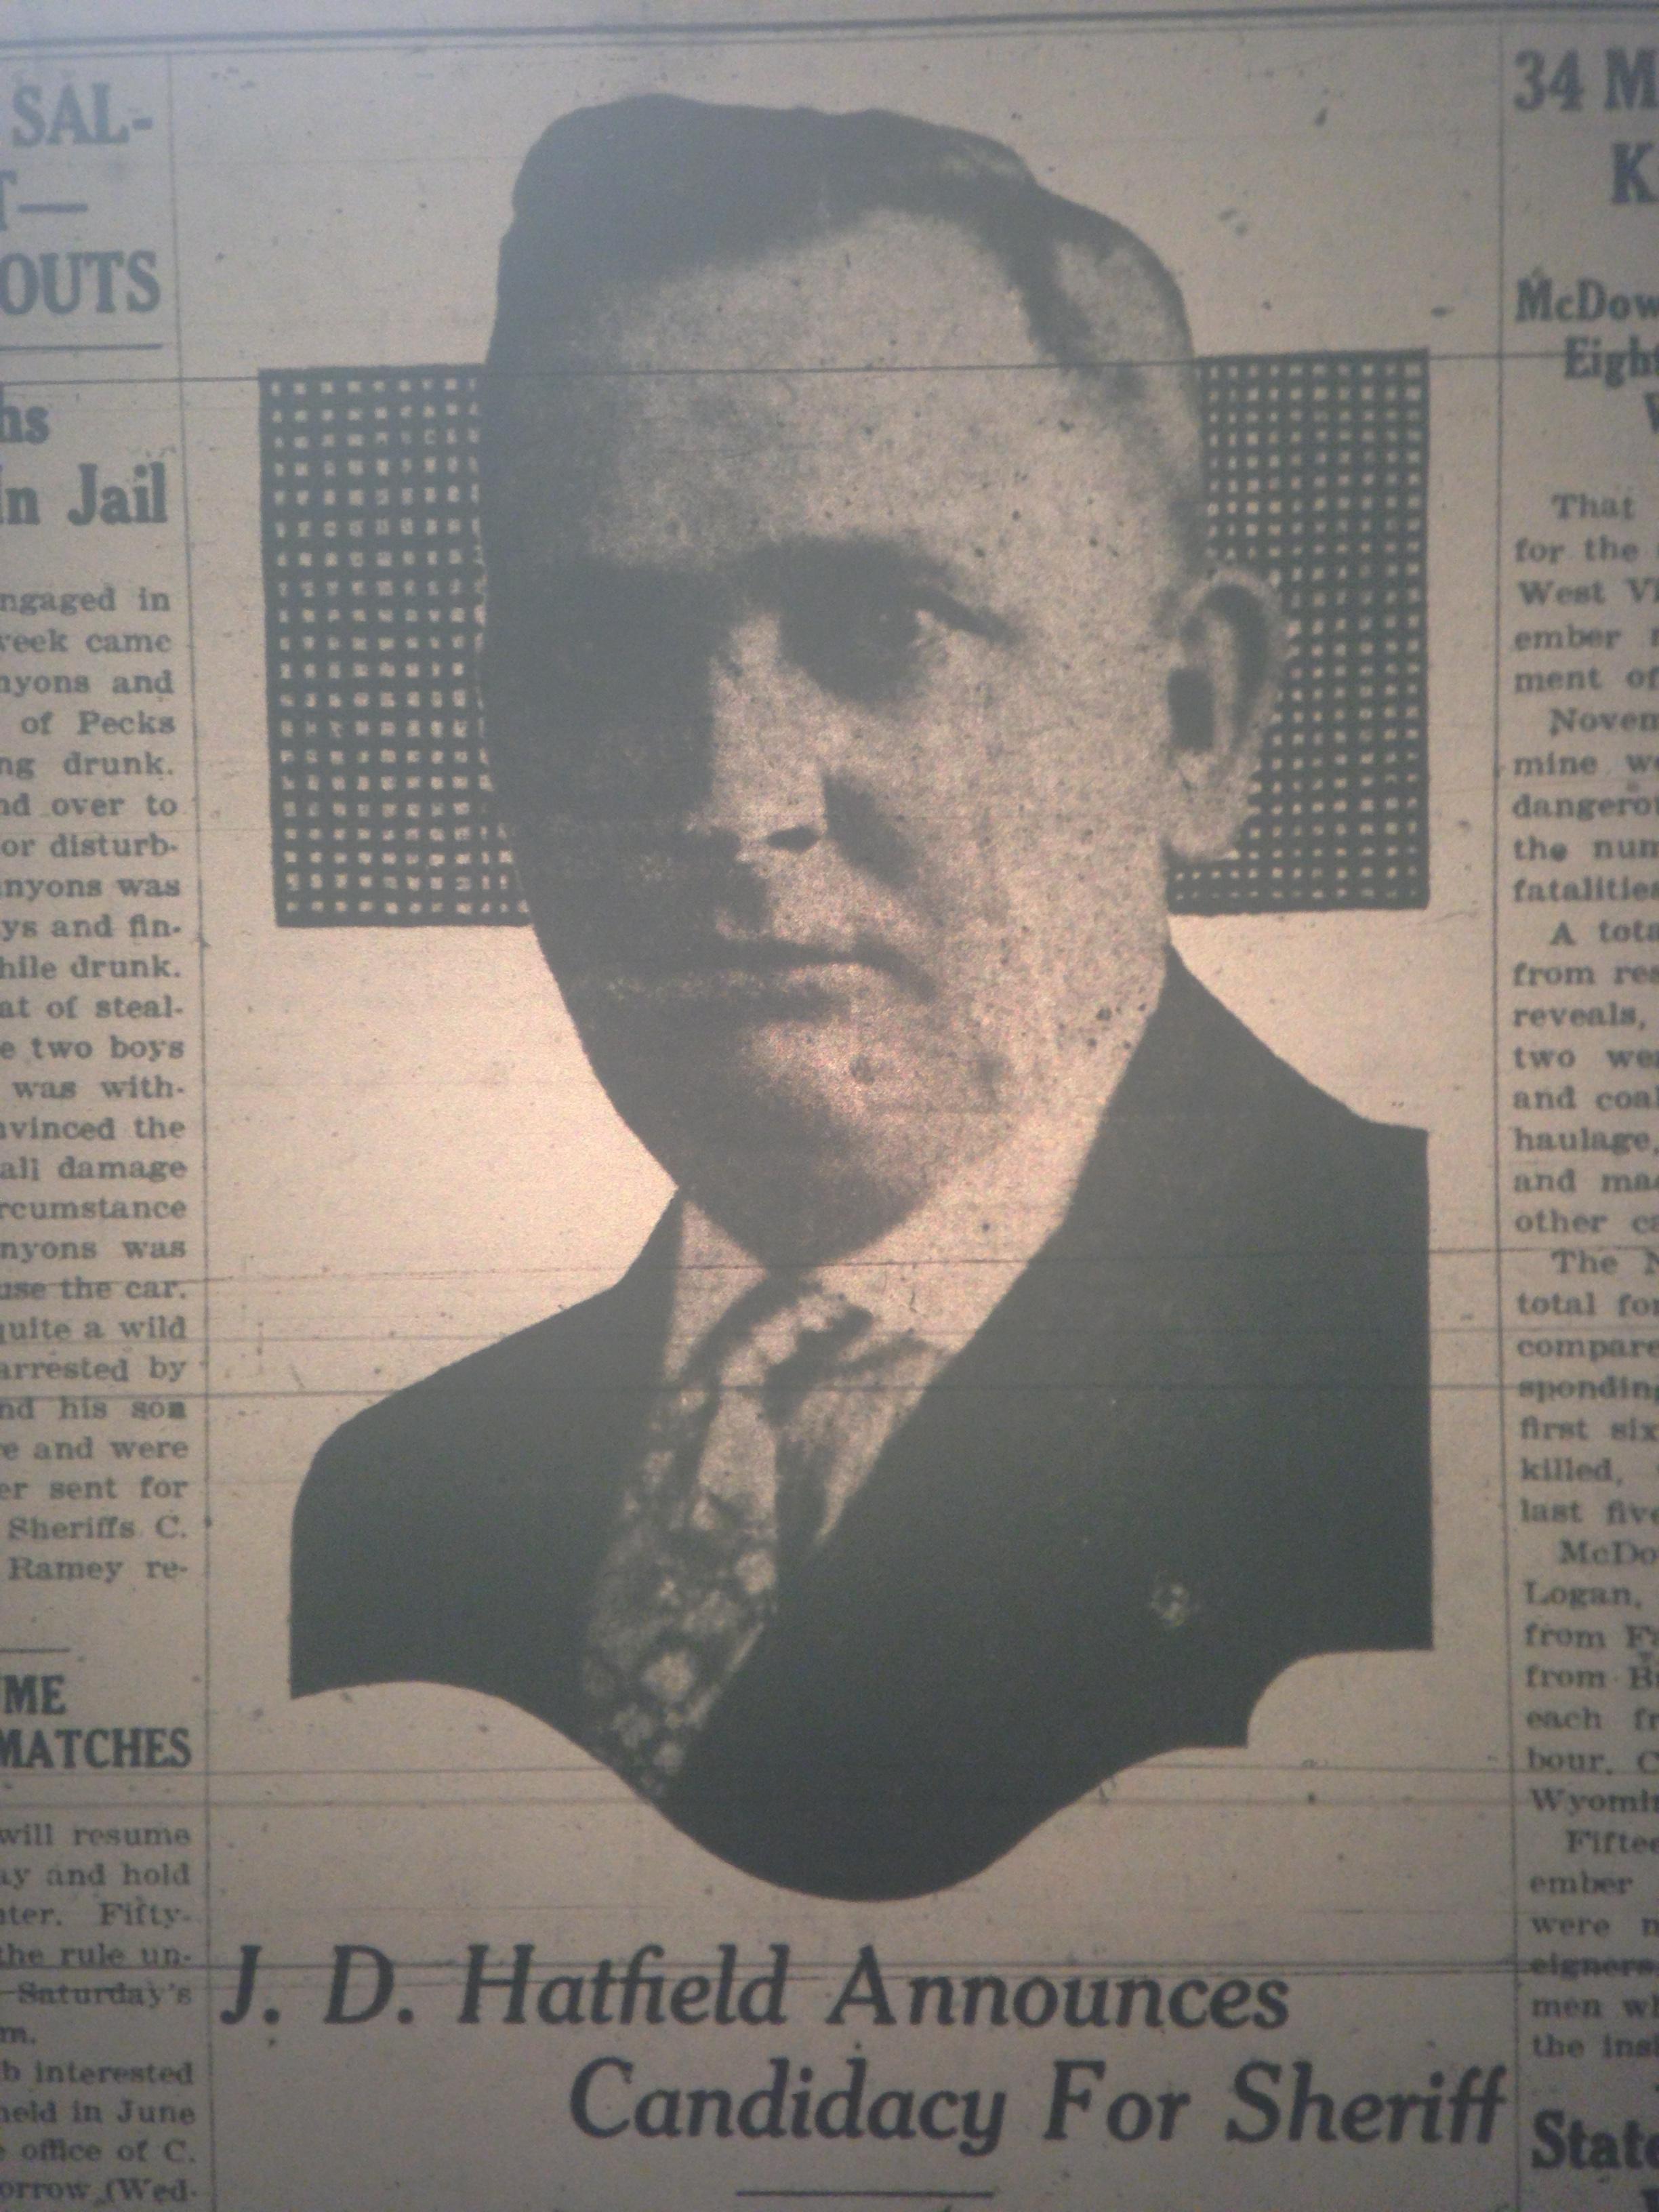 J.D. Hatfield for Sheriff 12.13.1927 1